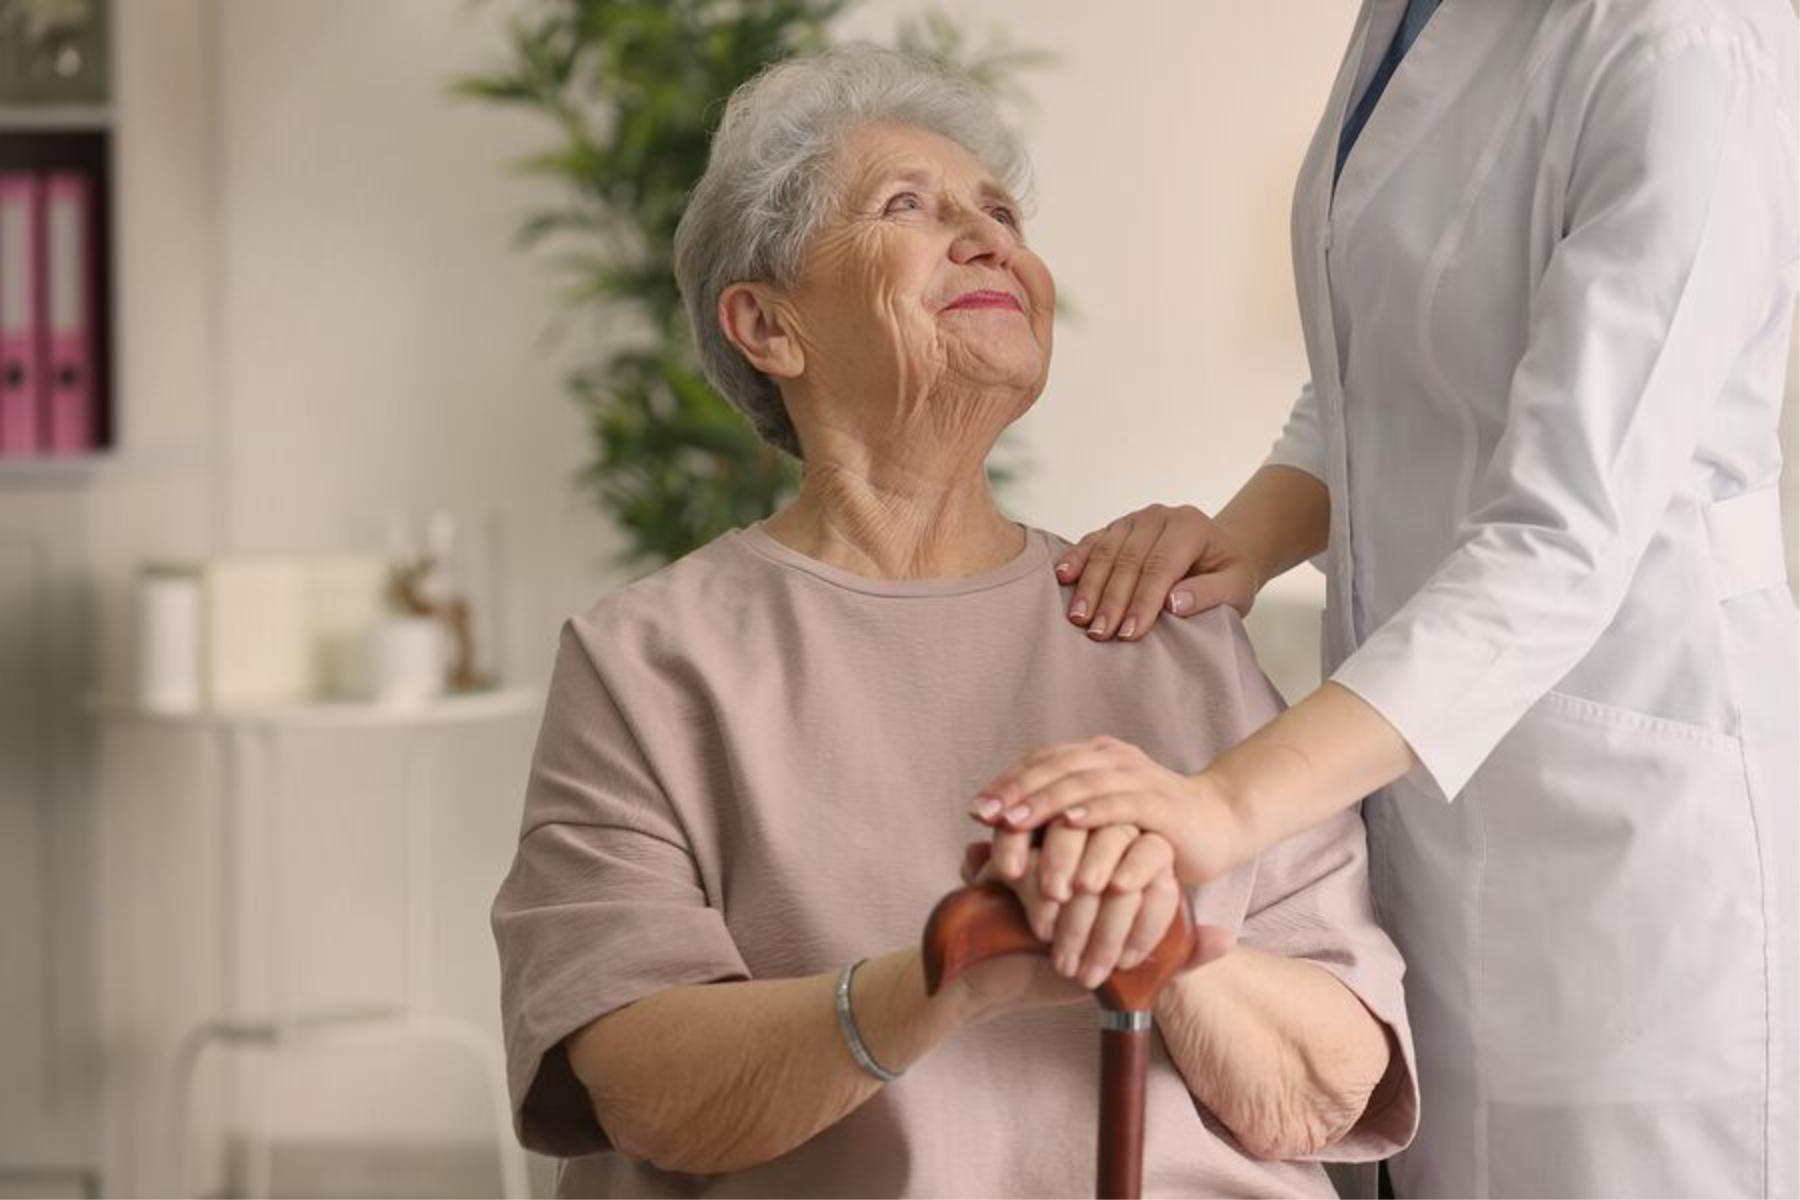 Home Care in Yuba City CA: Good Choice